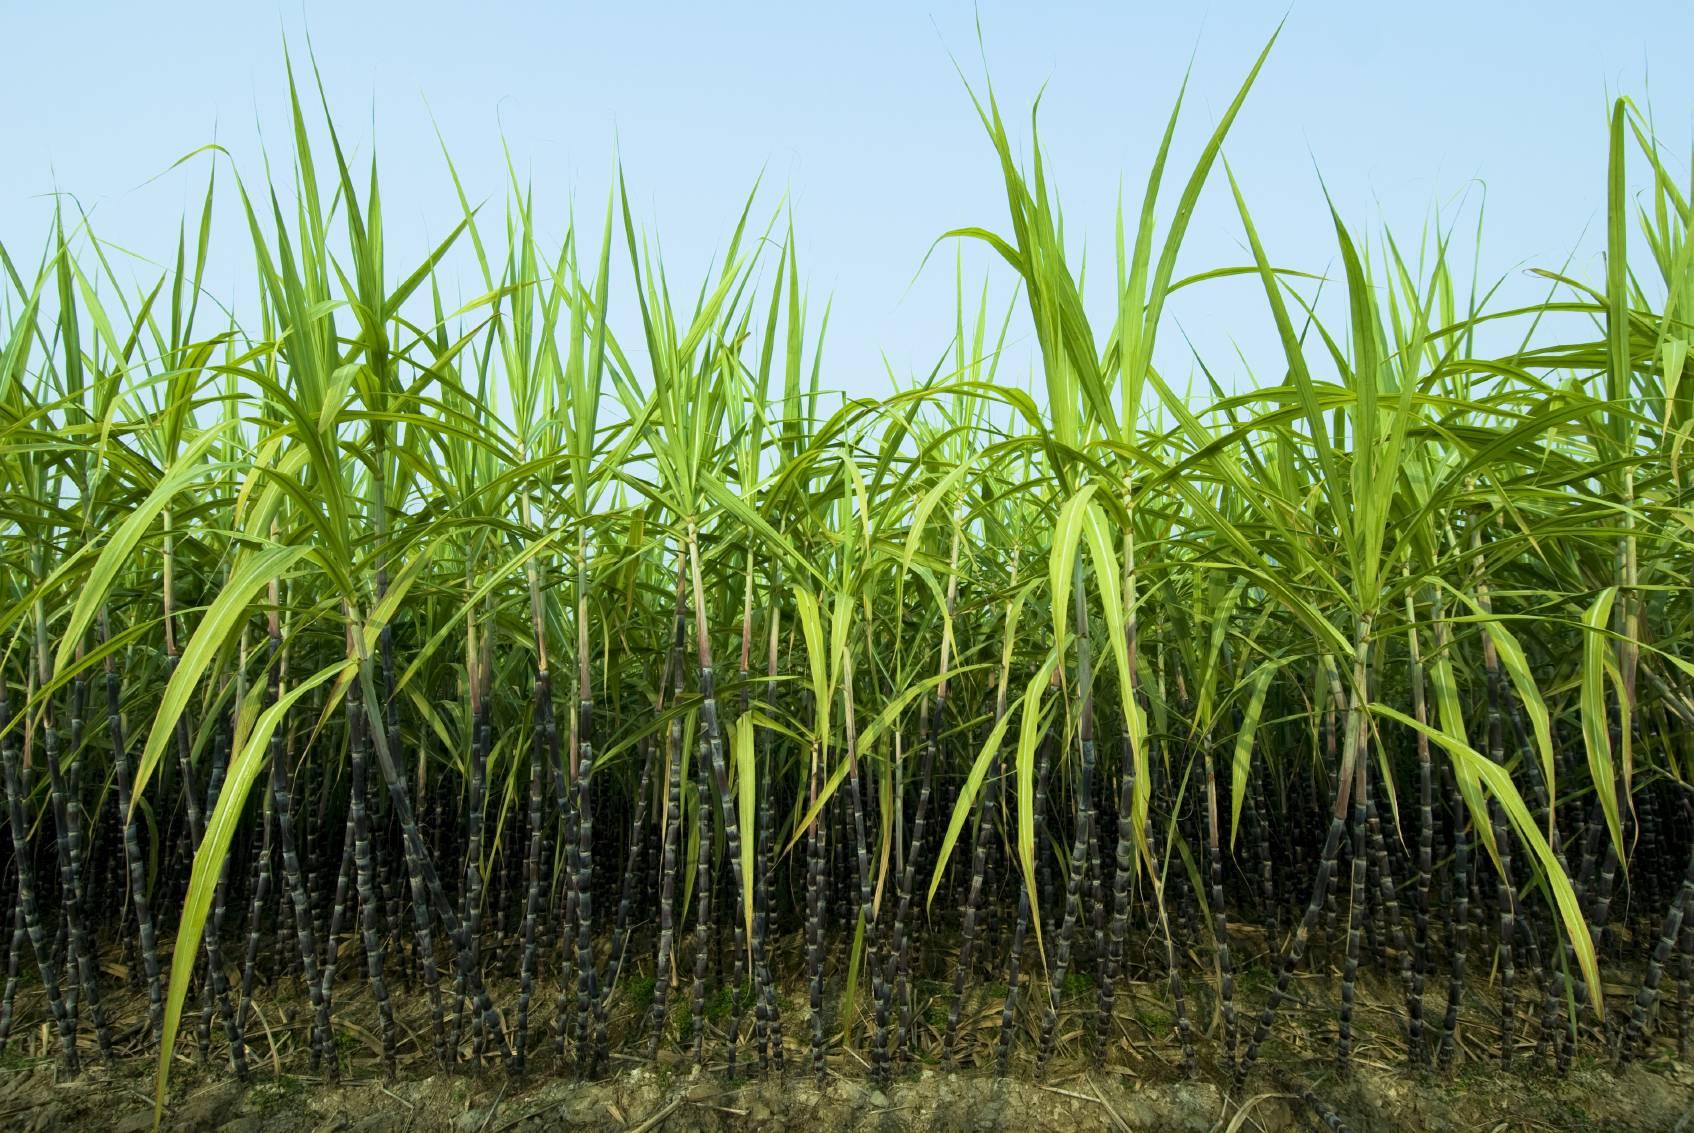 Sugarcane Wallpapers 1694x1133